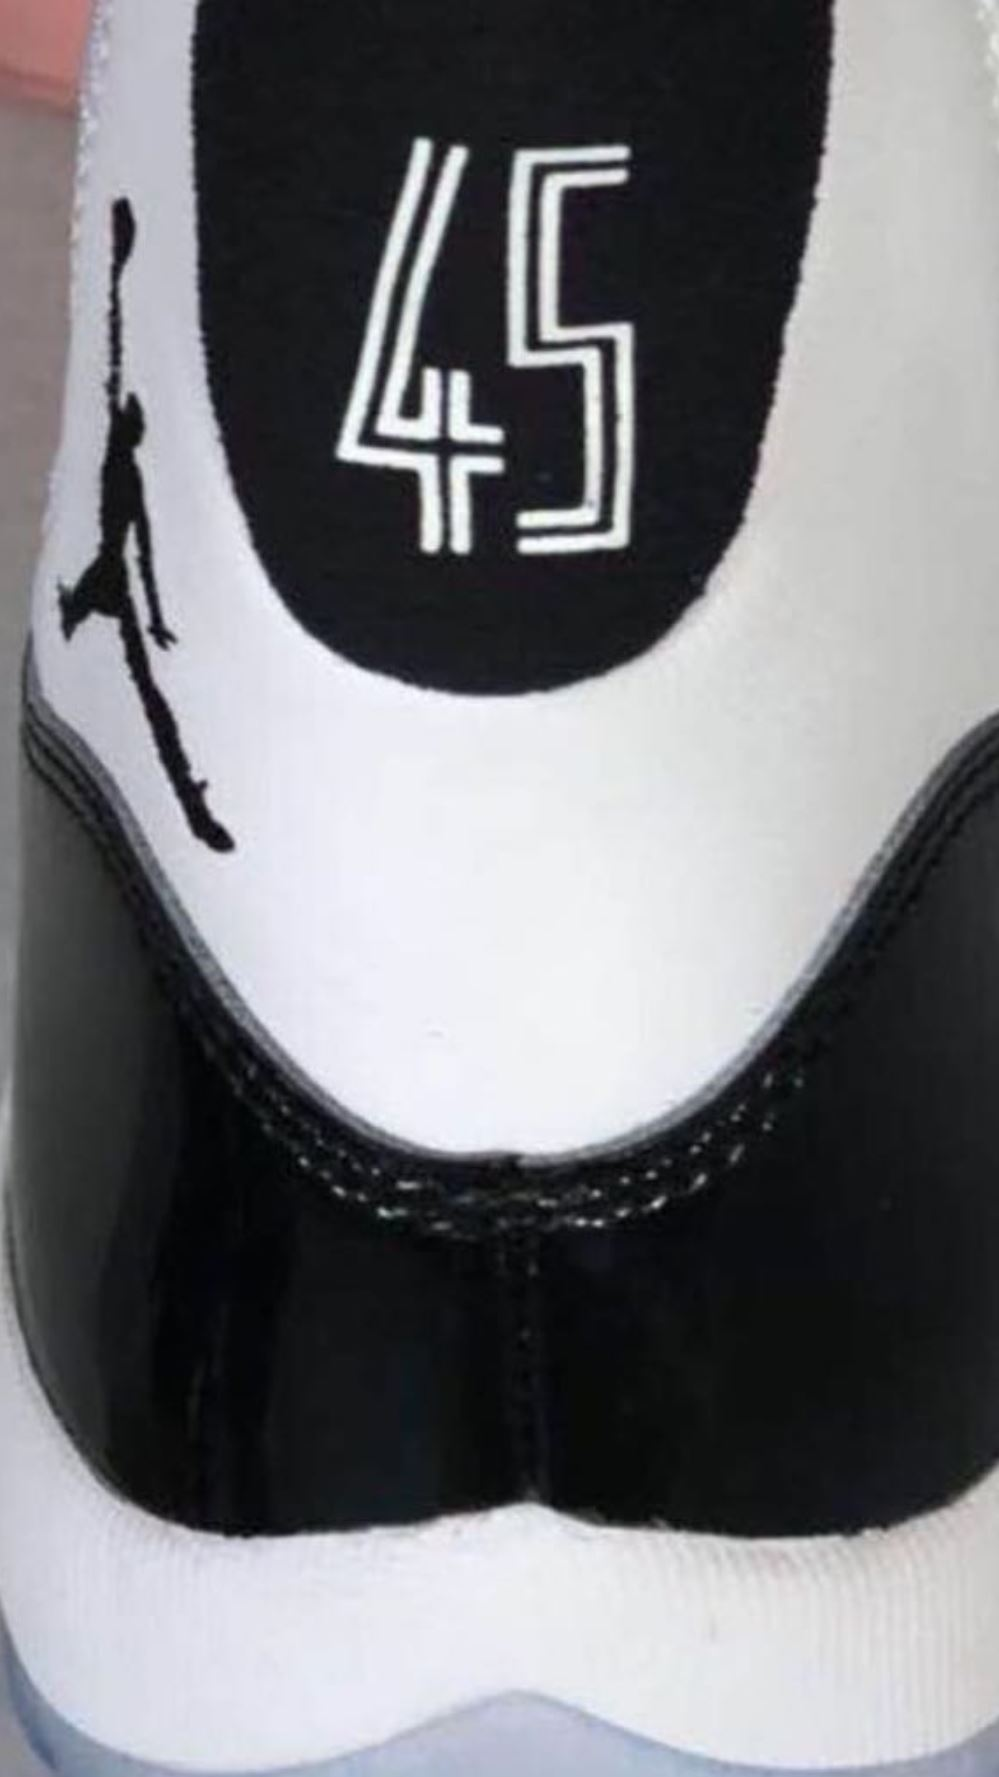 This Year's Air Jordan 11 'Concord